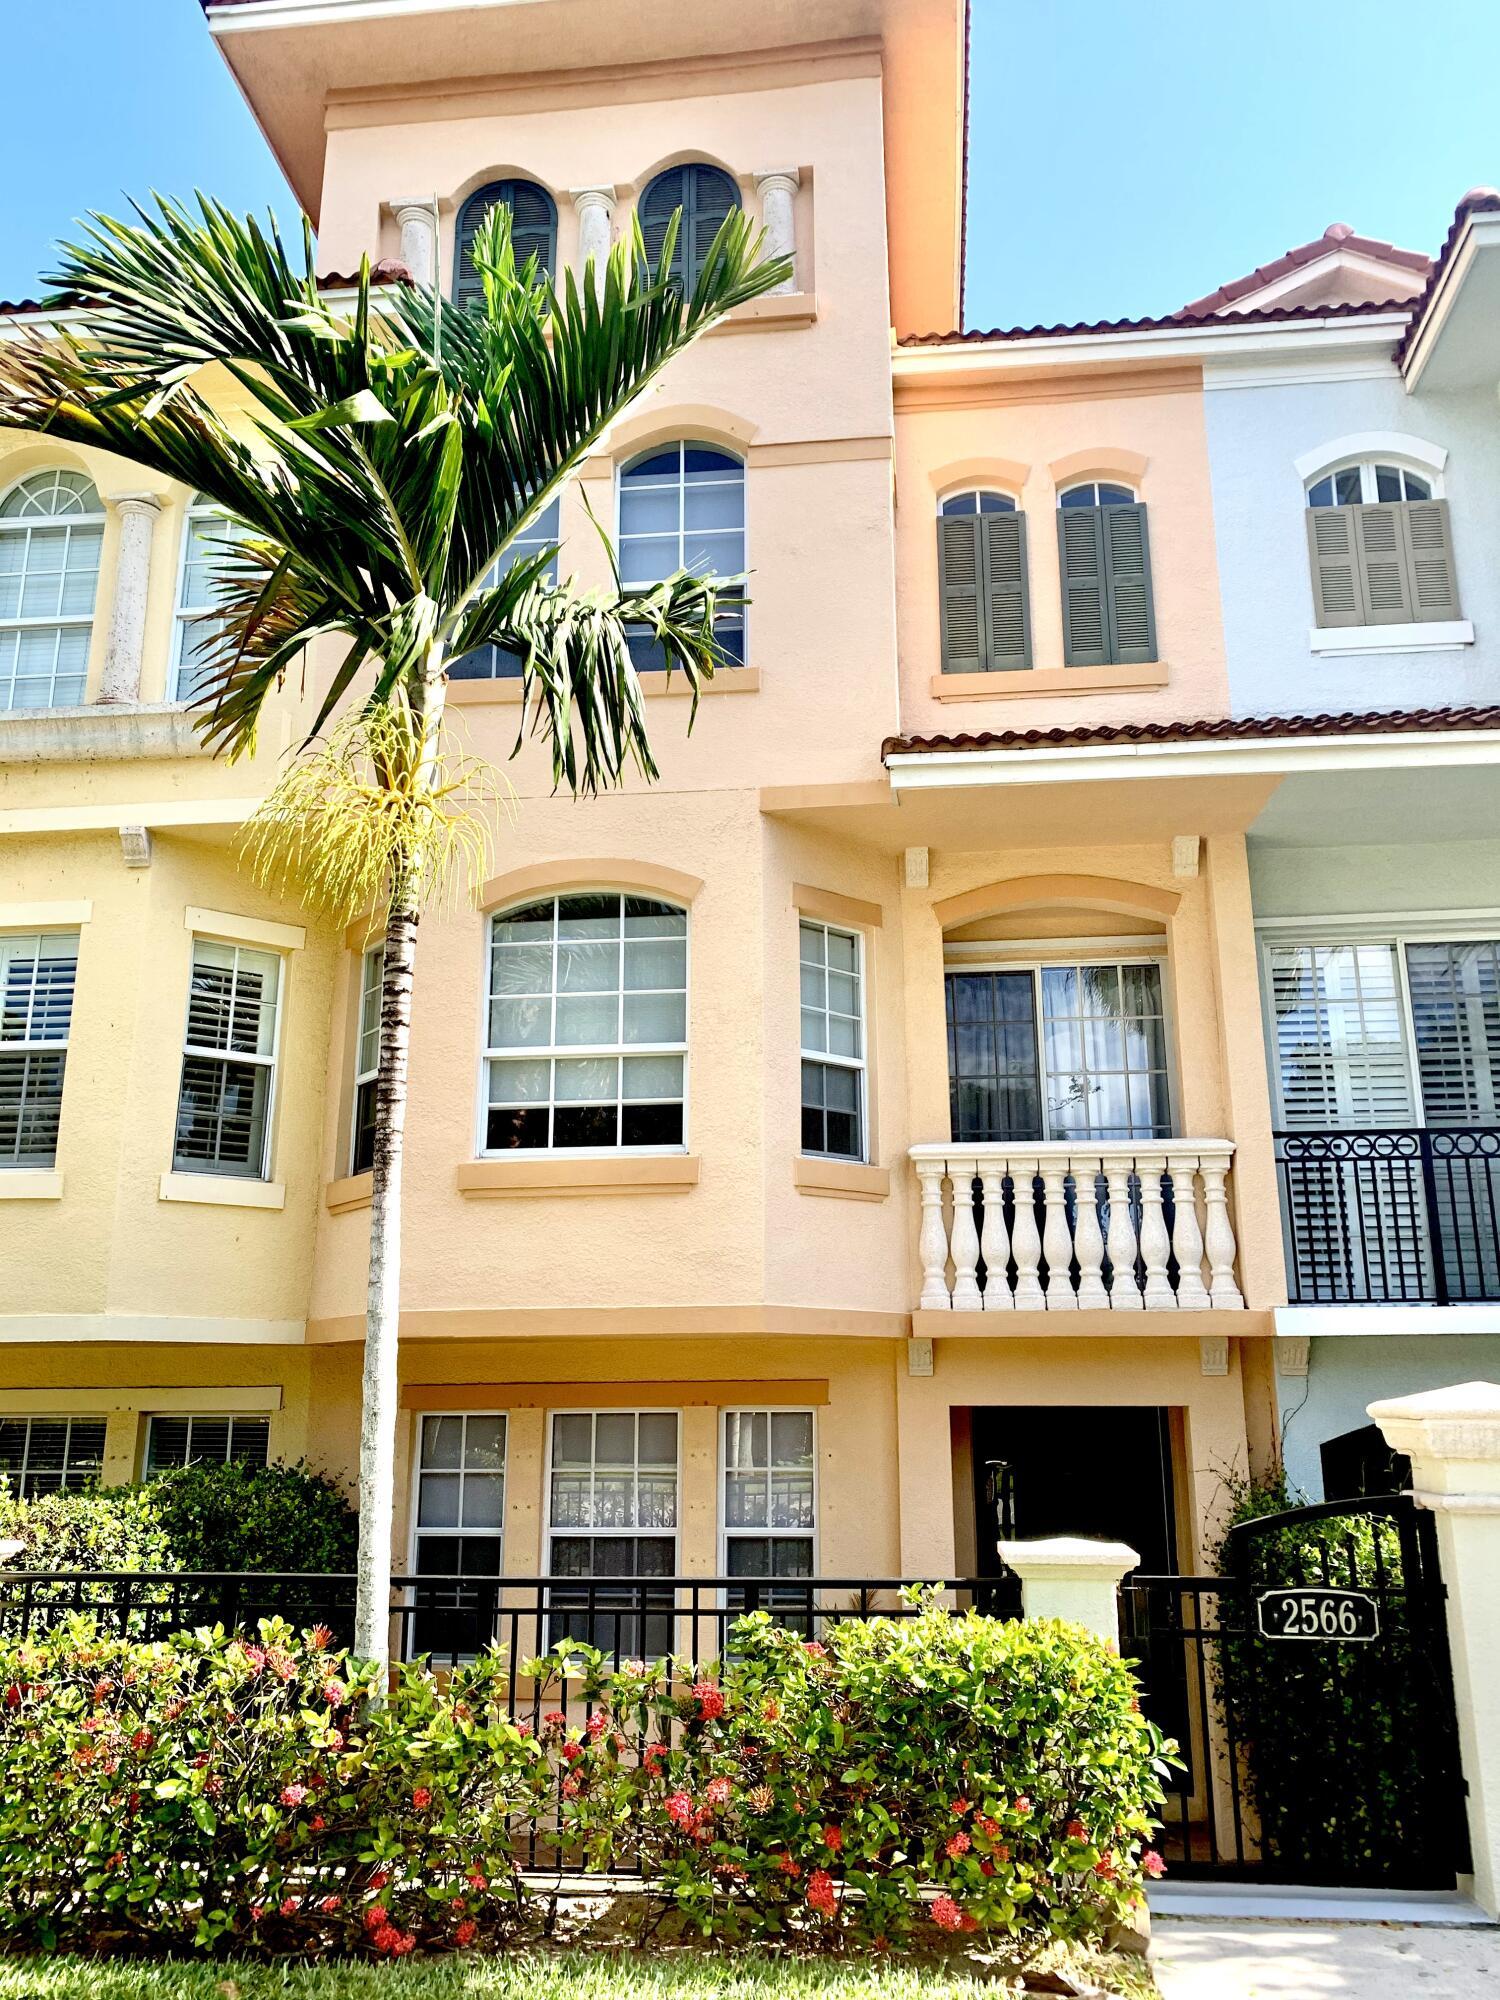 2566 Gardens Parkway Palm Beach Gardens, FL 33410